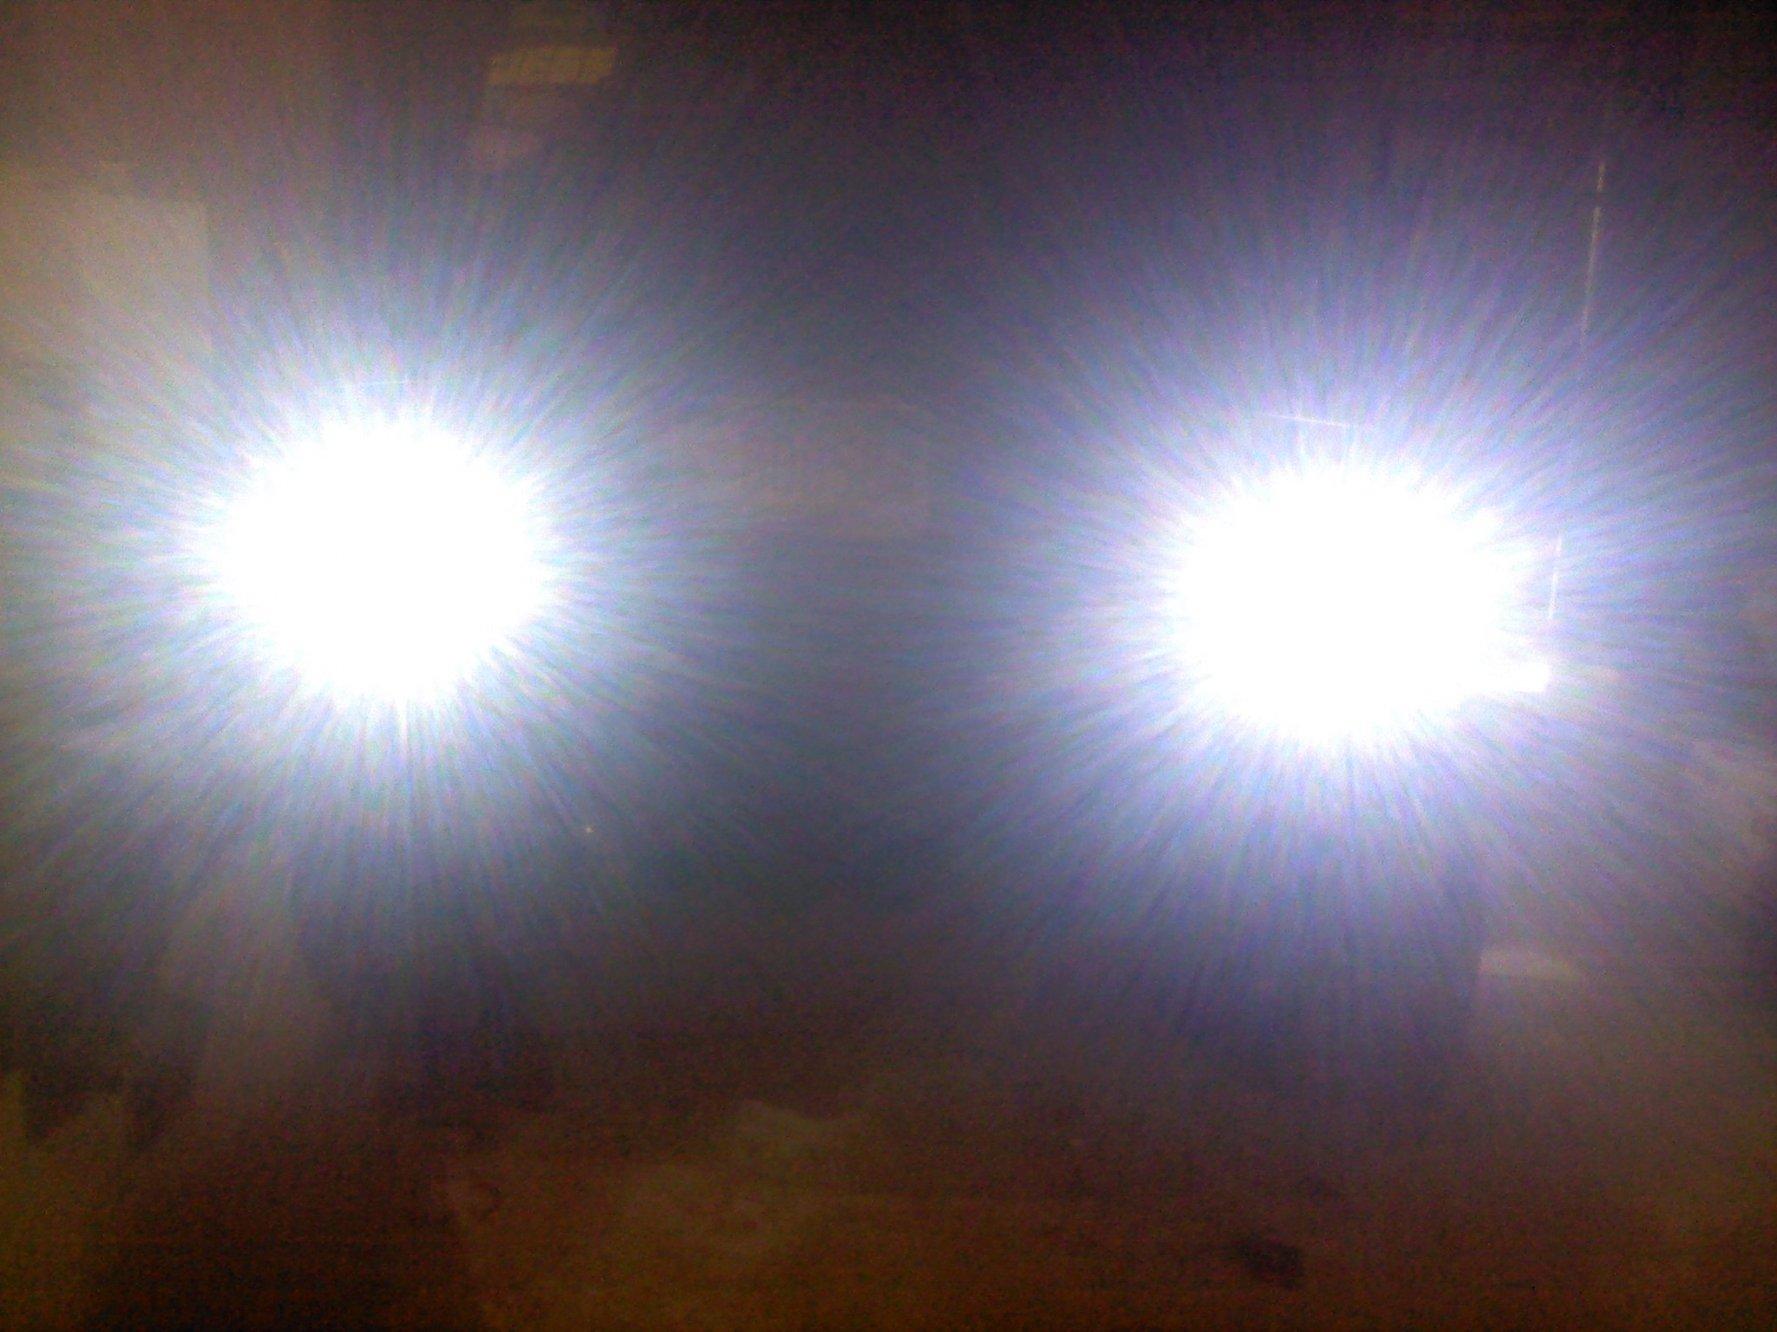 reverse-lights-.jpg